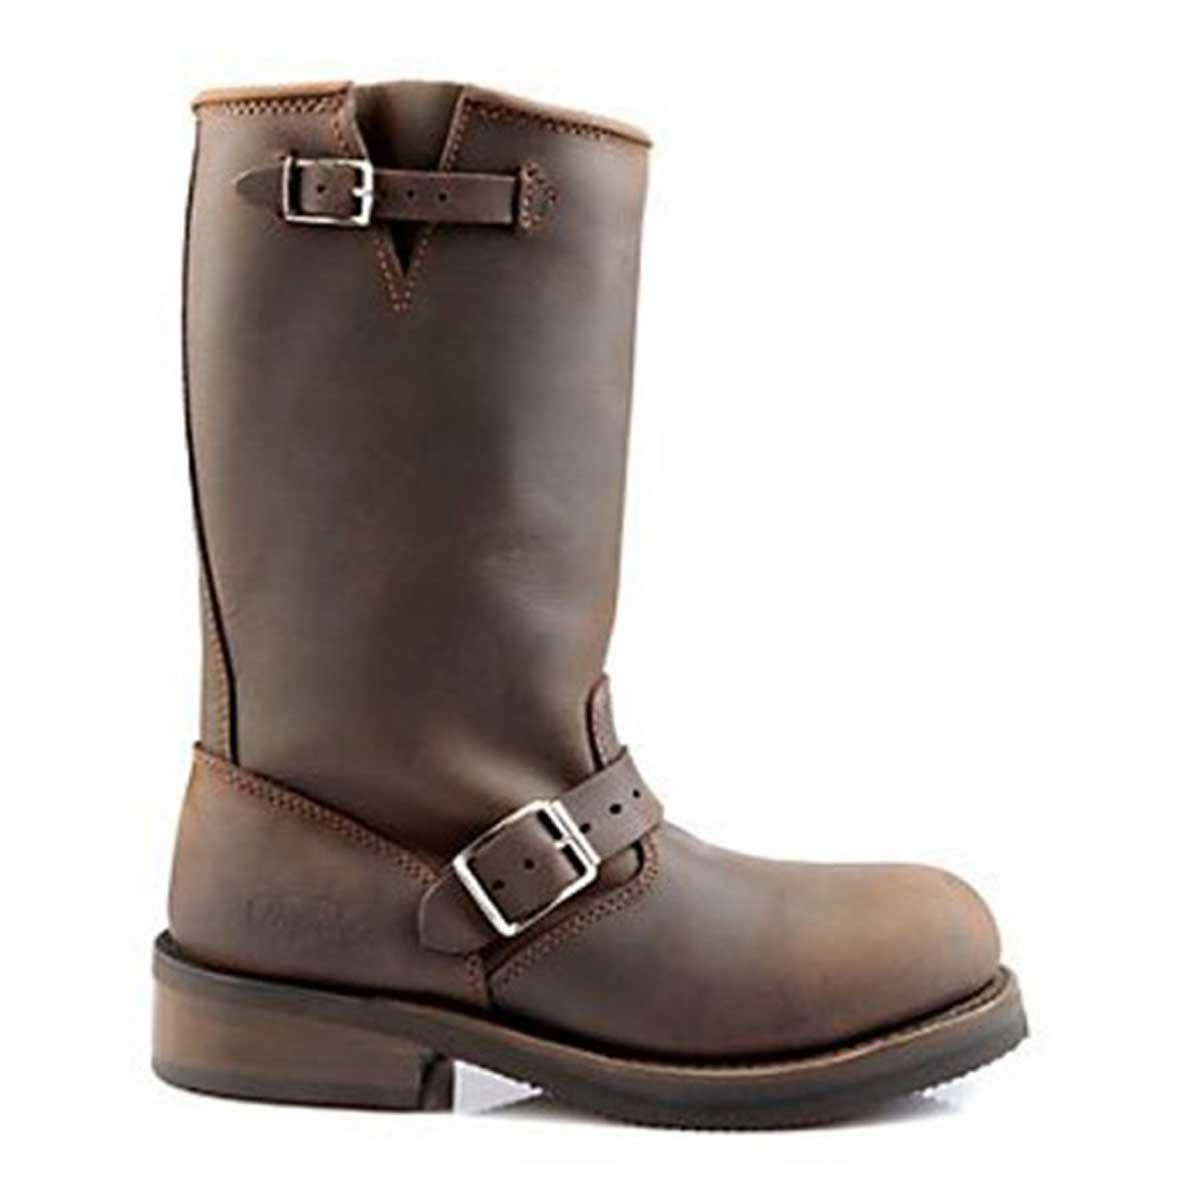 Buffalo Engineer Boots with Steeltoe